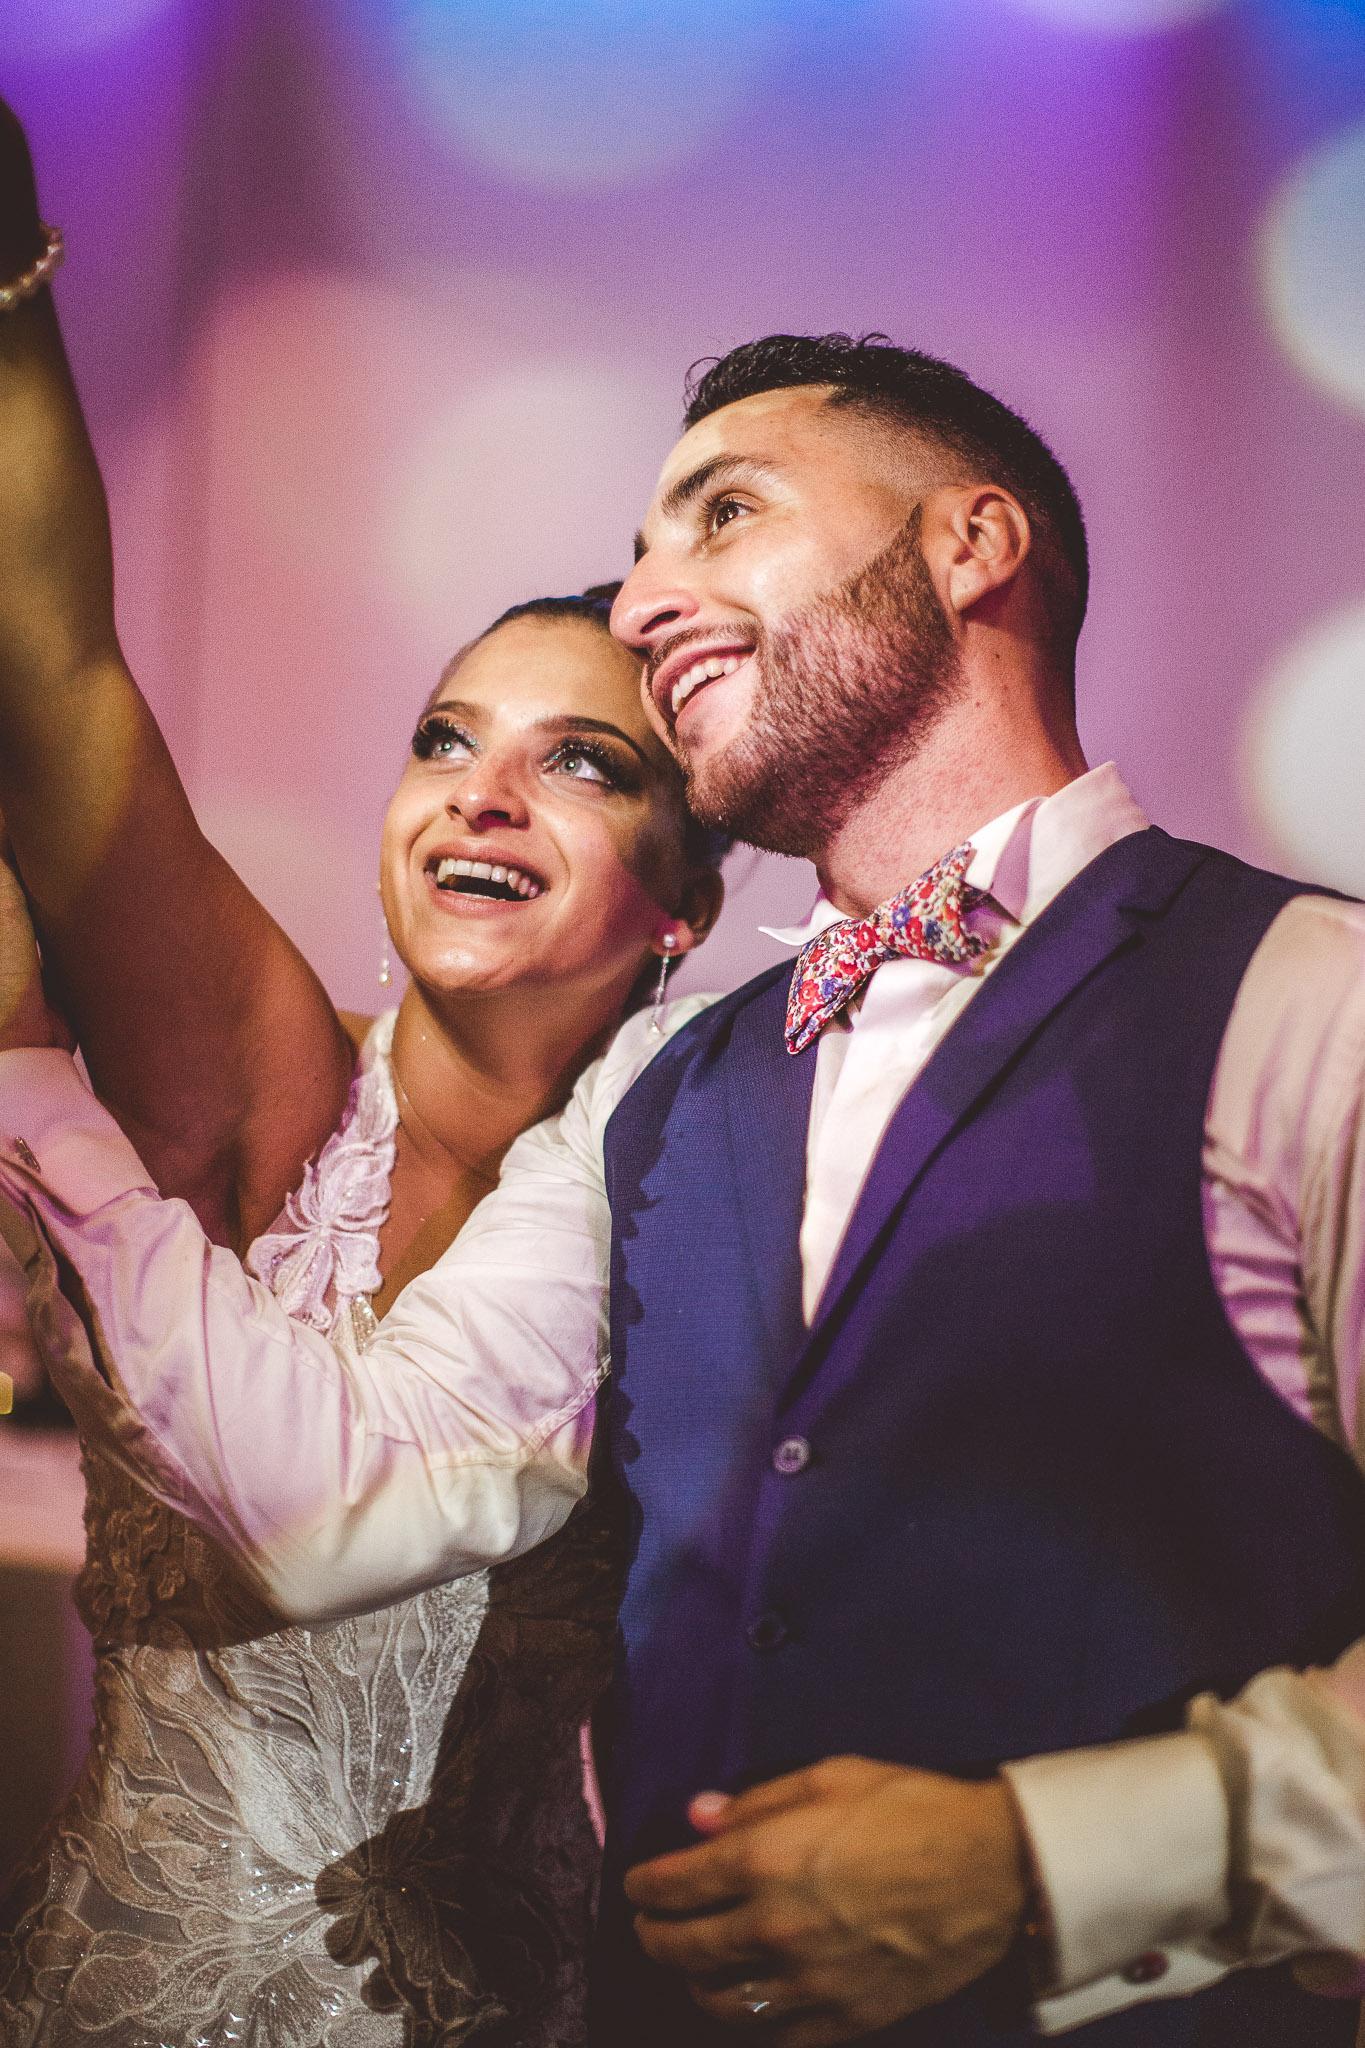 reportage mariage photo soiree gateau maries chateau mons gers